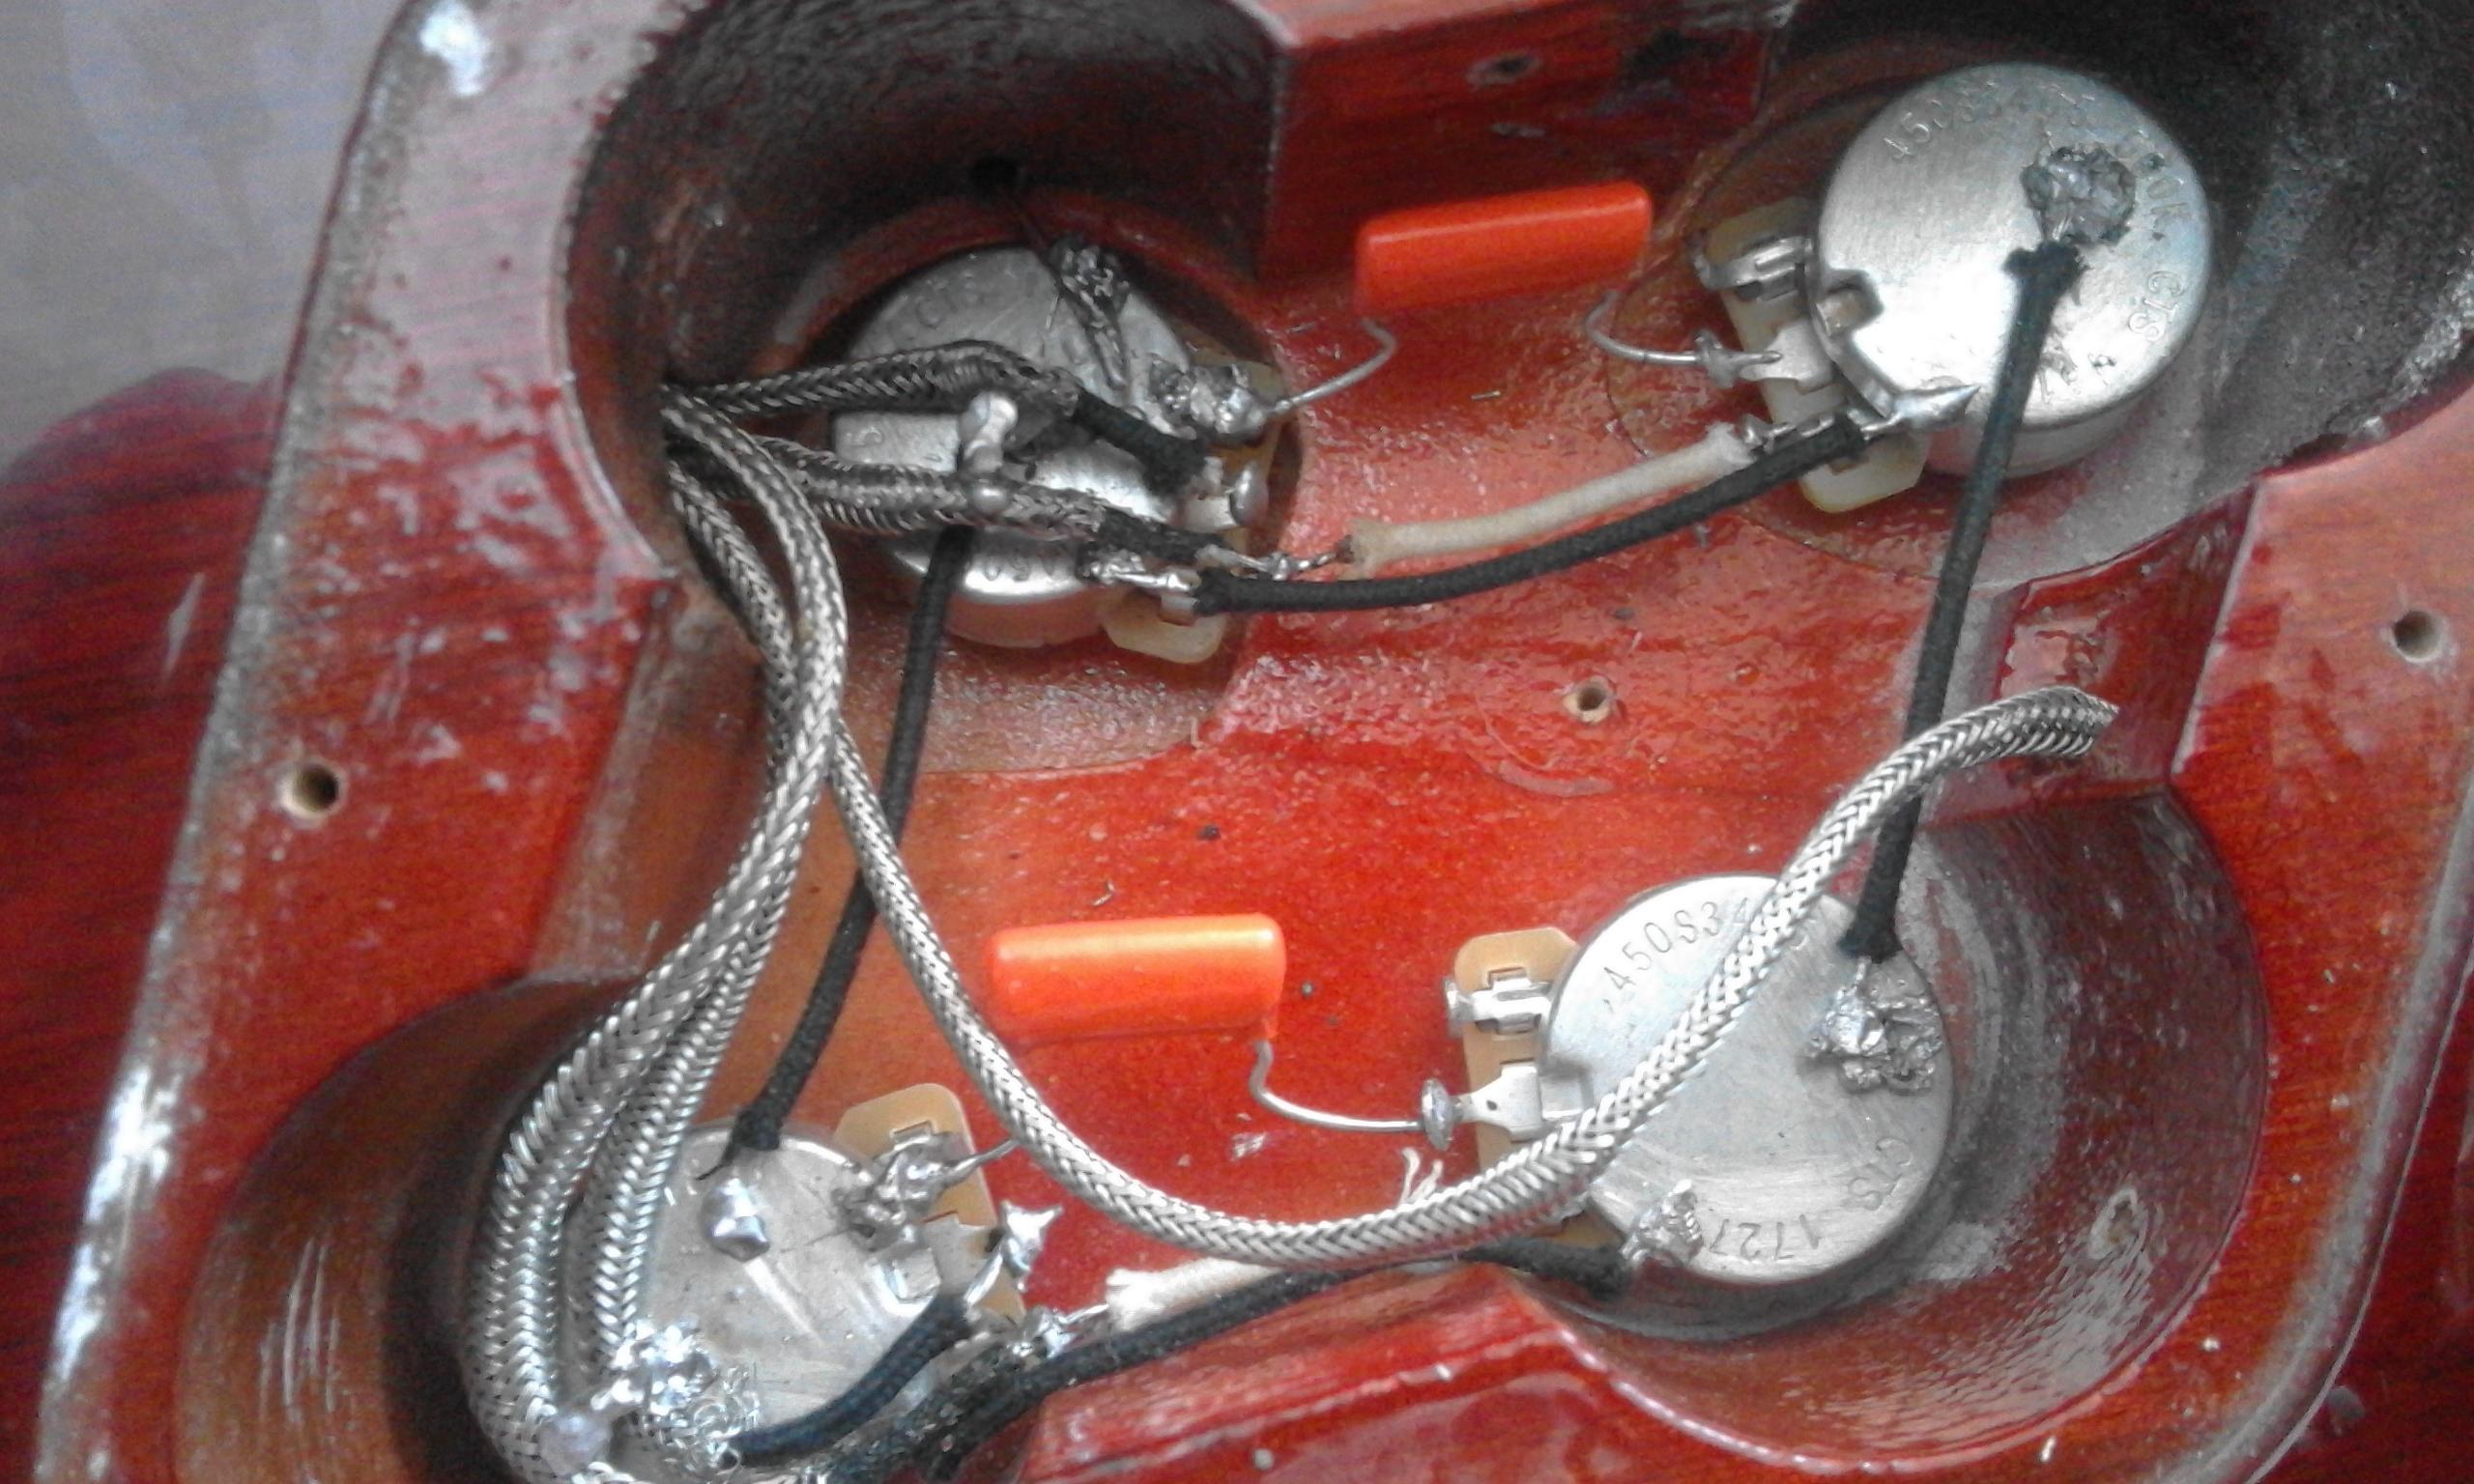 Upgrade Harley Benton 450 vintage plus (l'ennesimo)